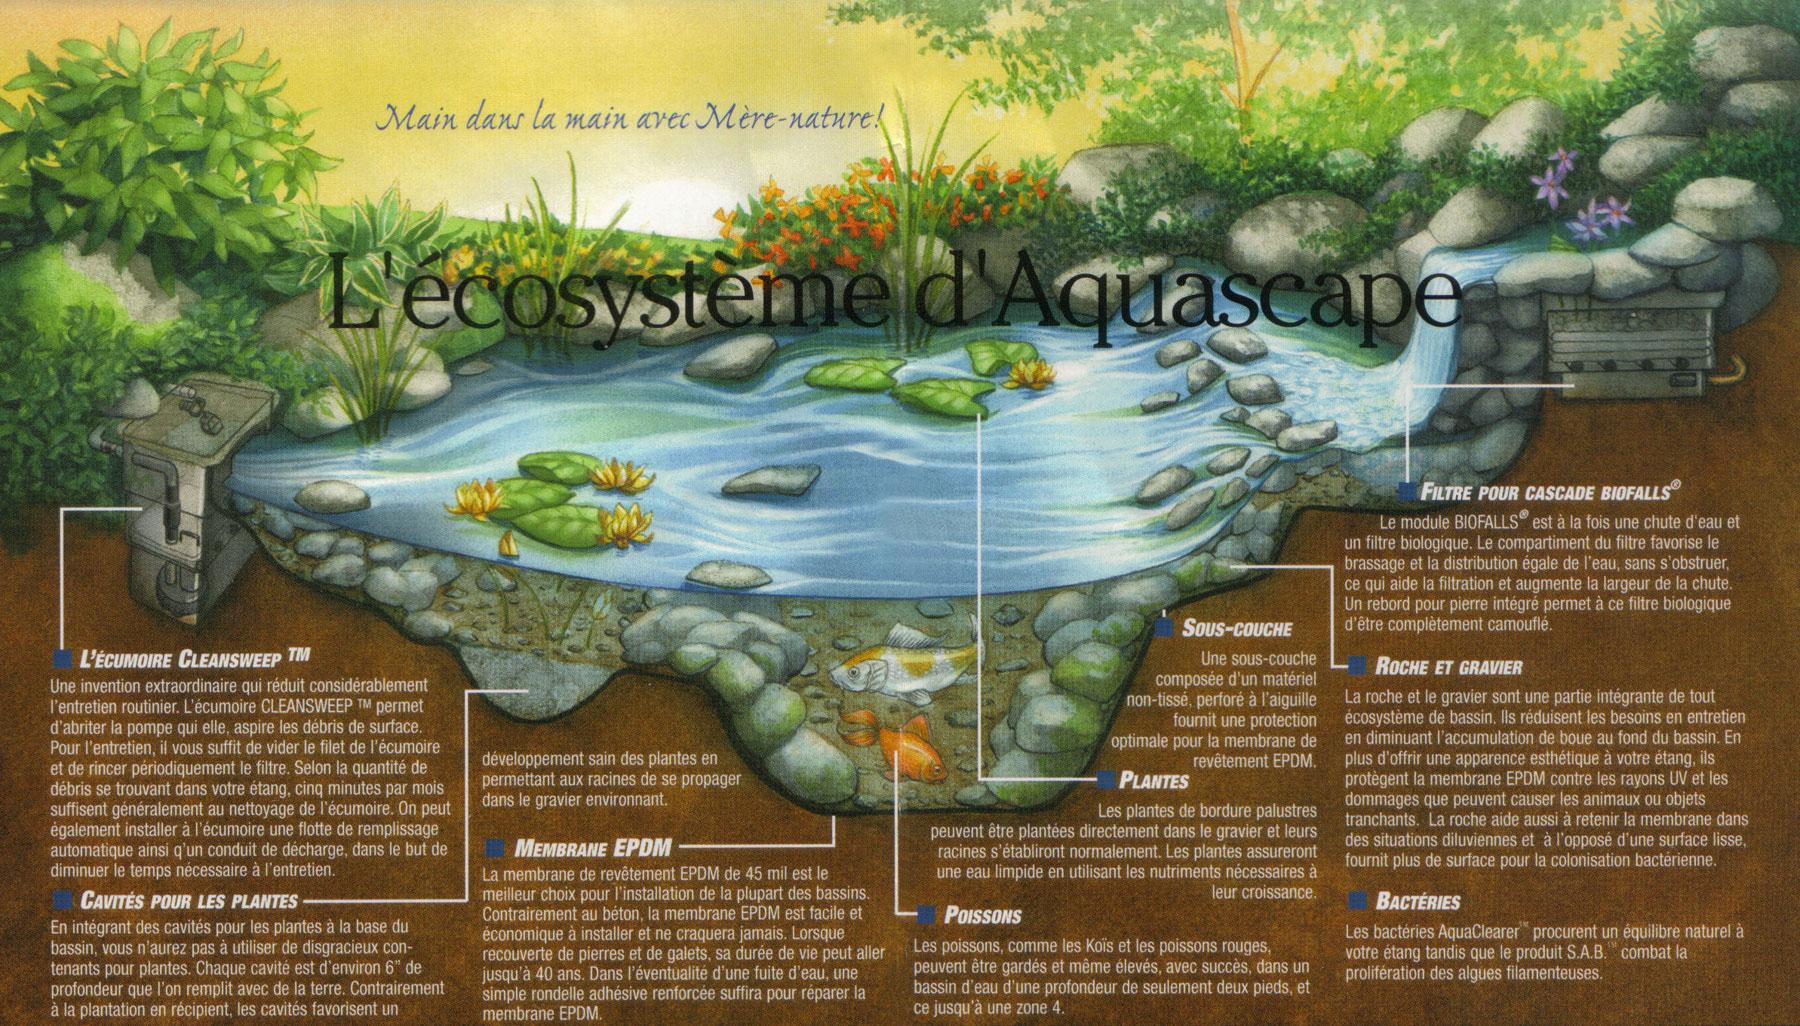 25 Ans, 25 Projets Coup De Coeur - Jardins Aquadesign serapportantà Chute D Eau Bassin De Jardin